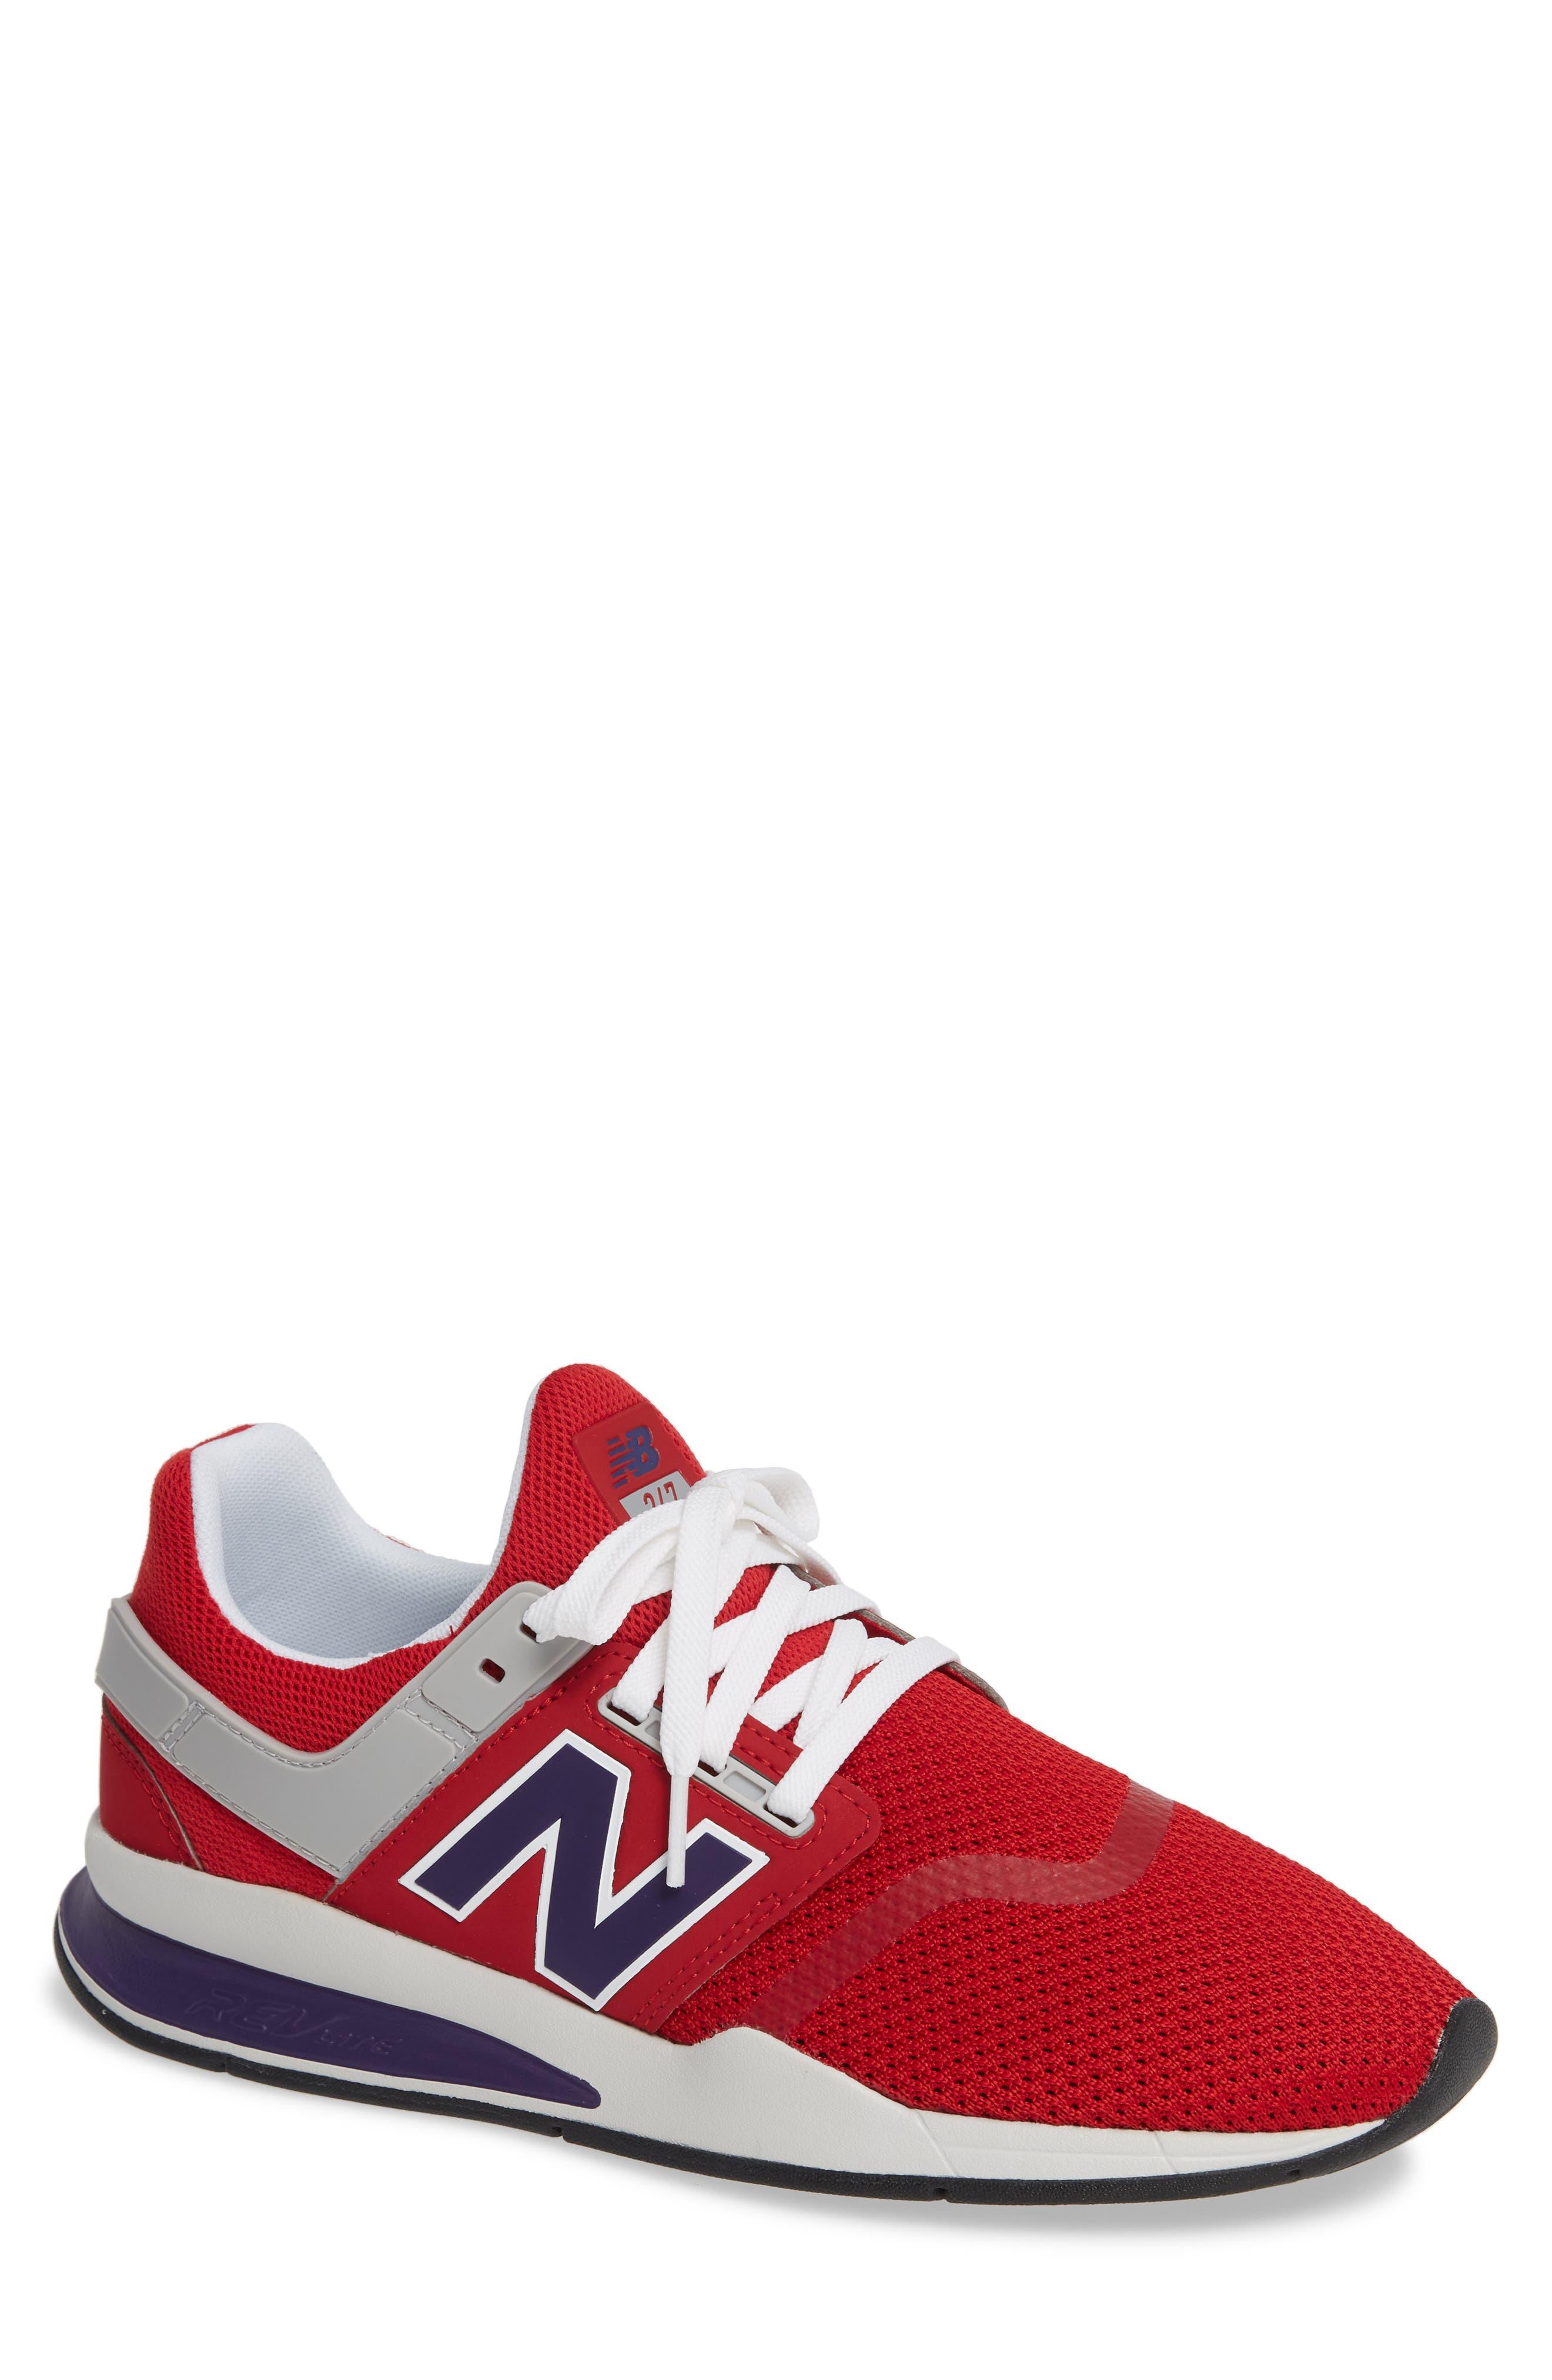 247 Sneaker,                             Main thumbnail 1, color,                             TANGO RED SYNTHETIC/ MESH